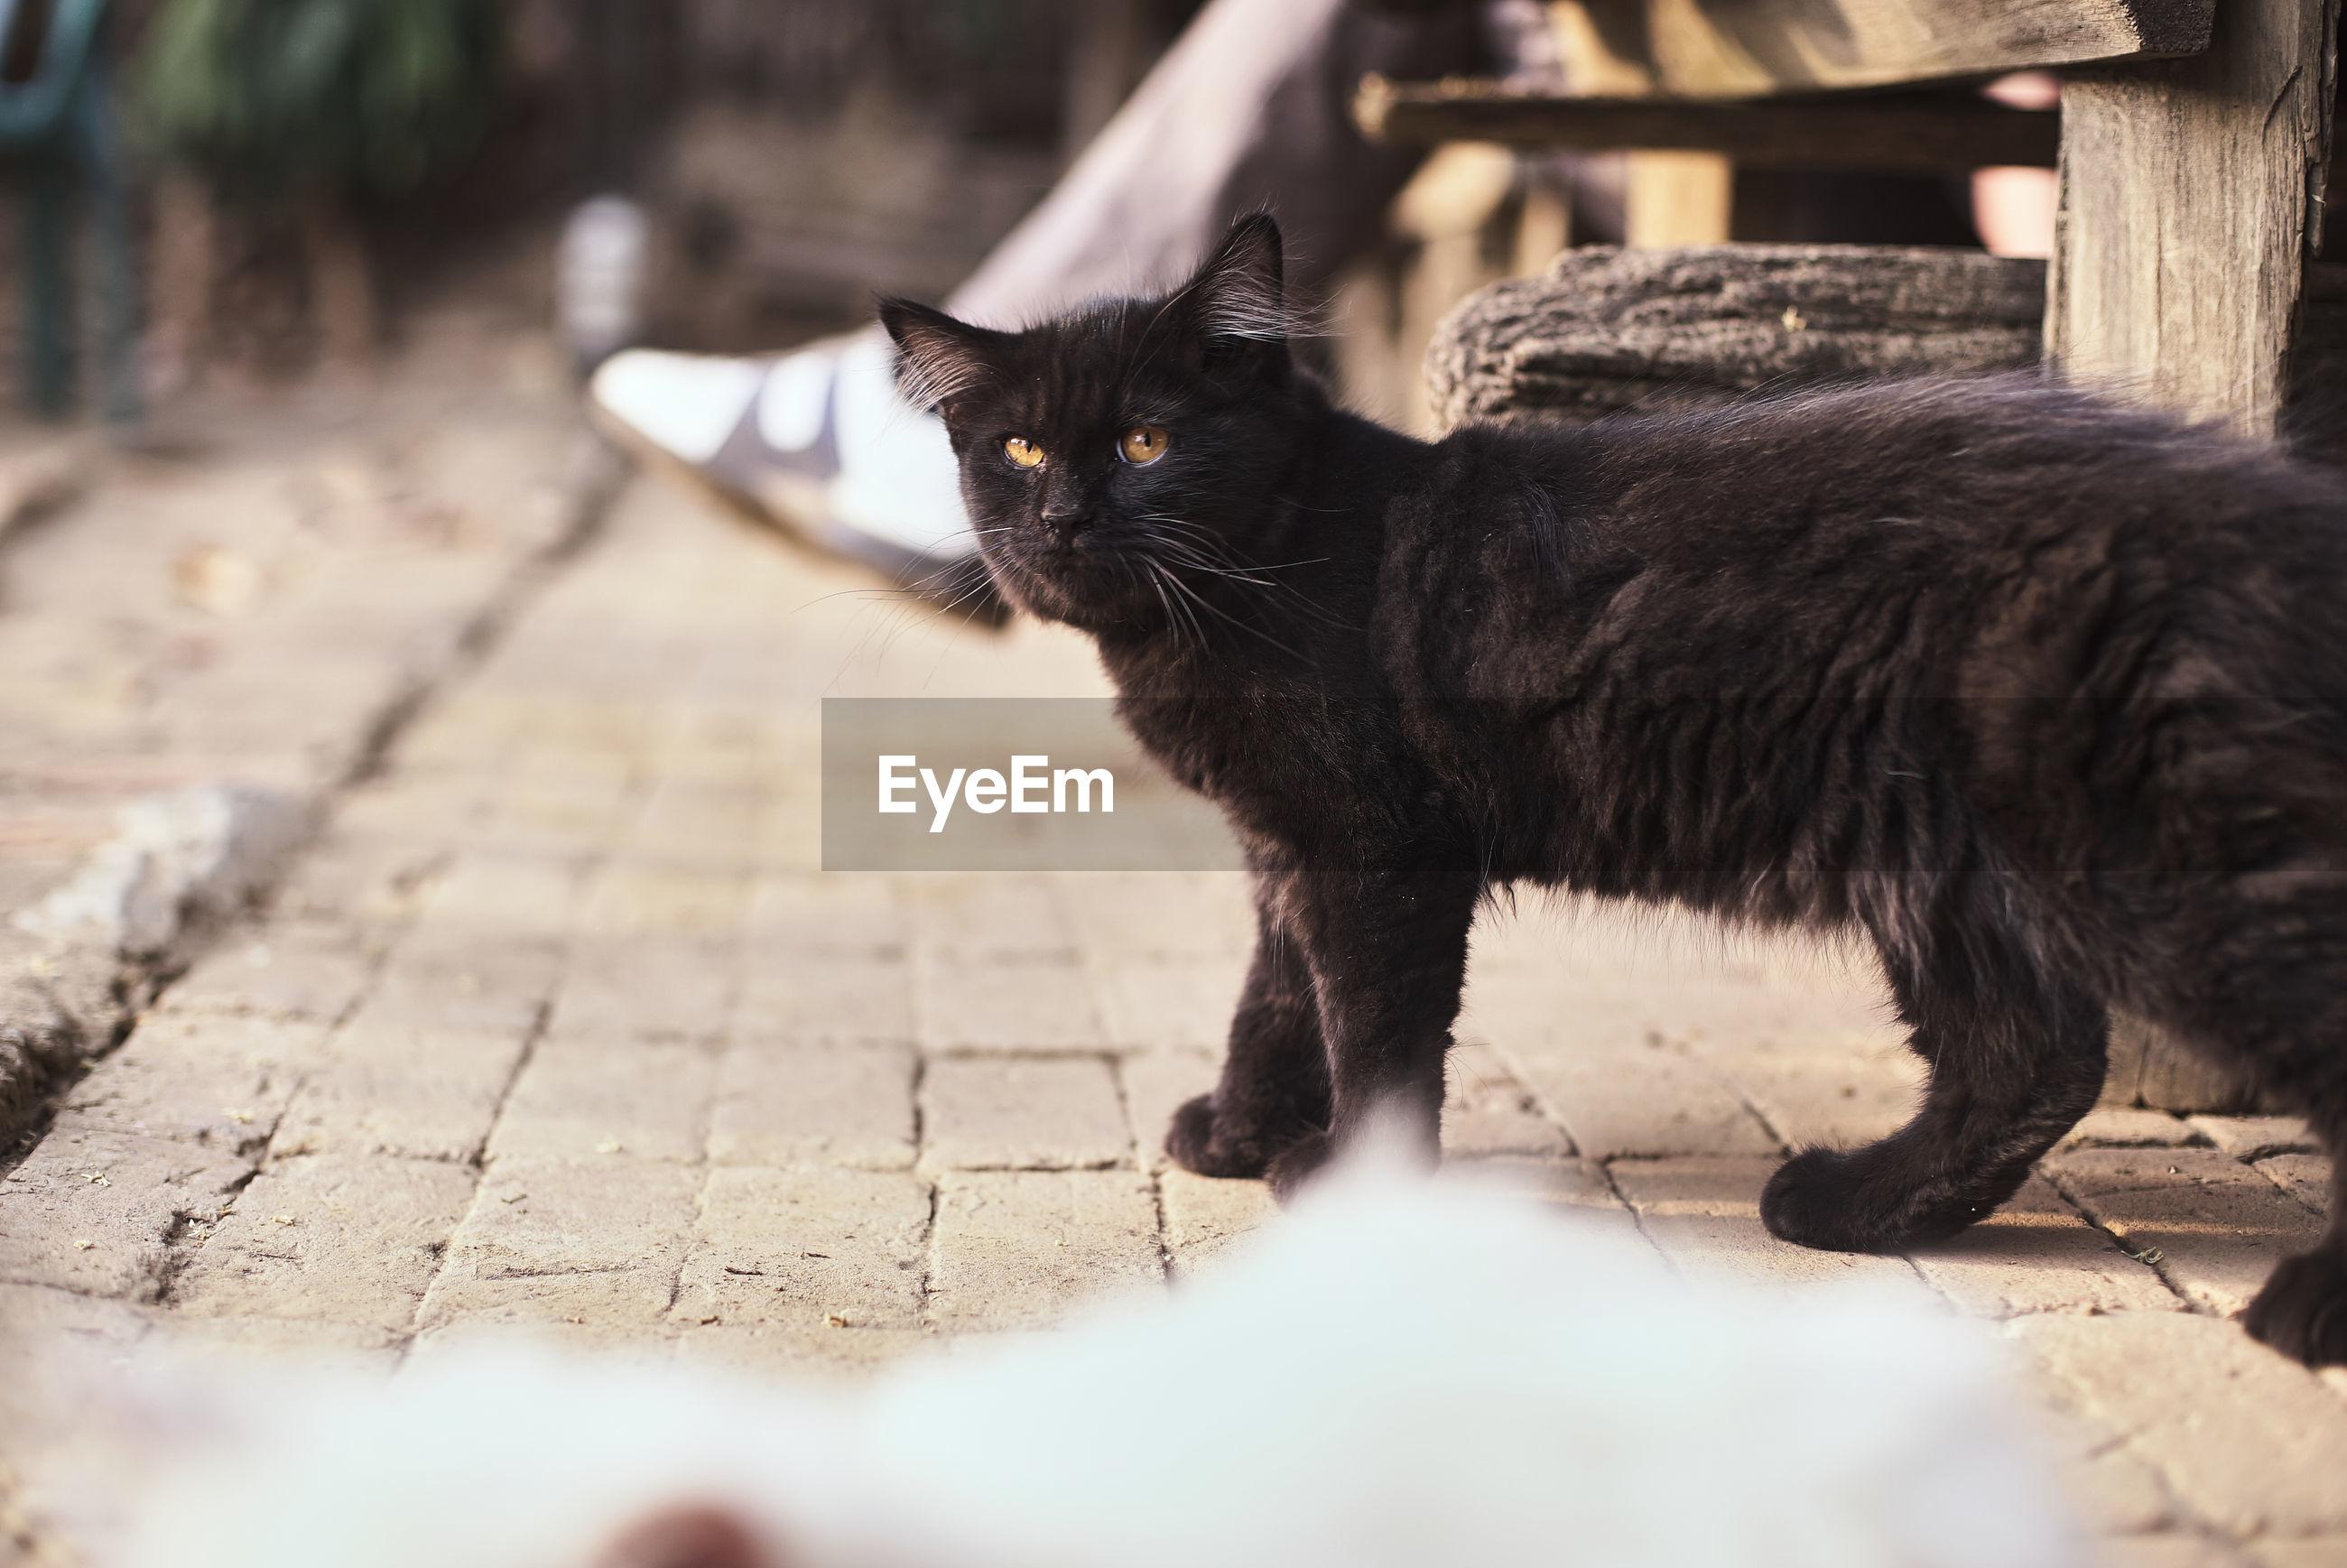 Portrait of black cat on footpath